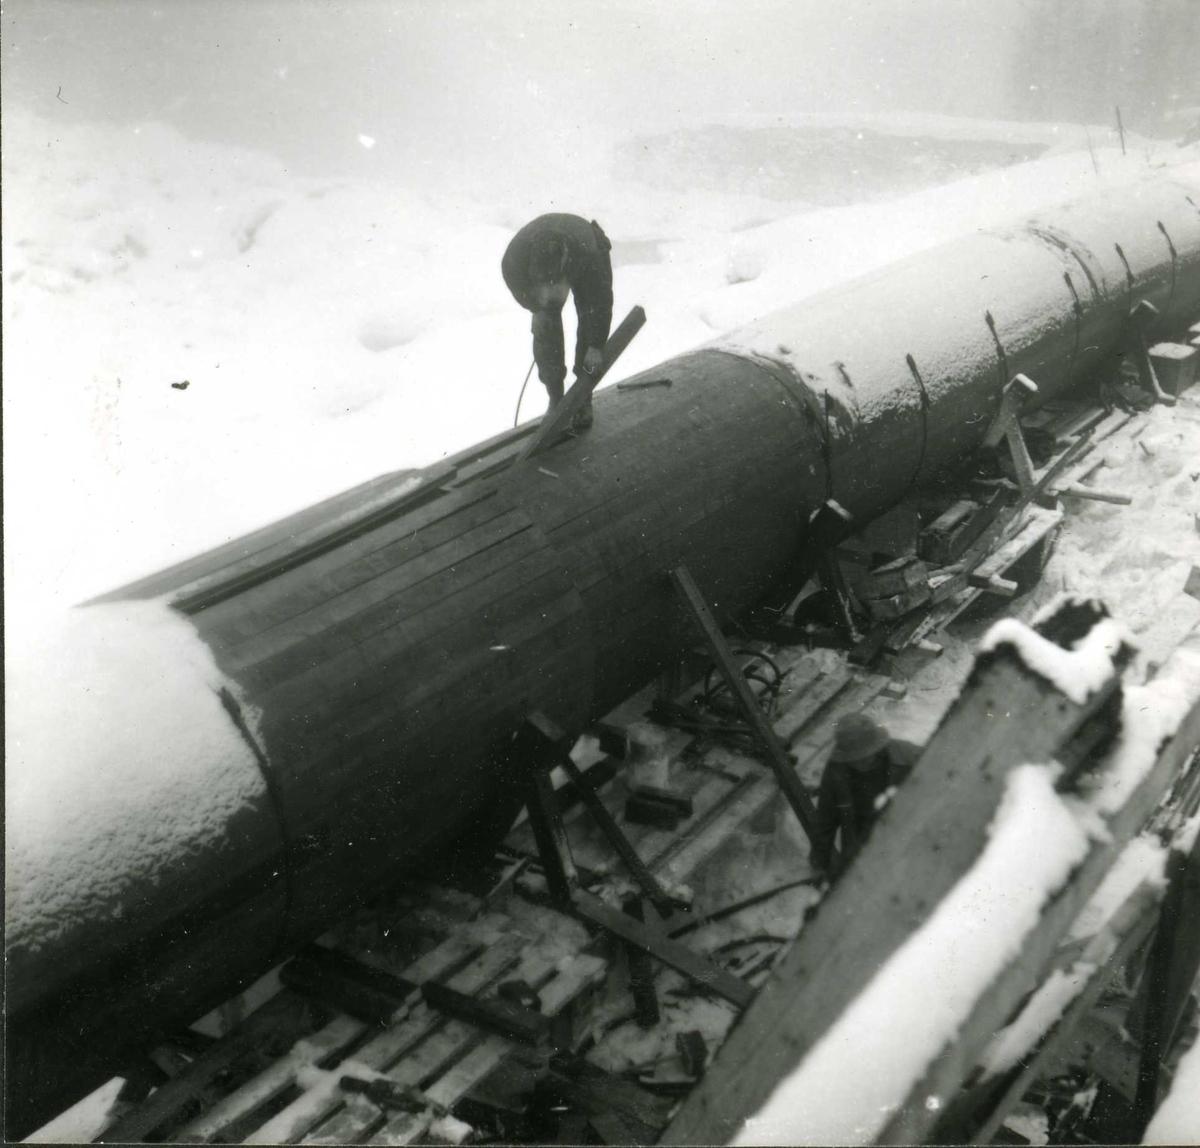 184-5 Person i arbeid rørgate Hyllandsfossen kraftverk